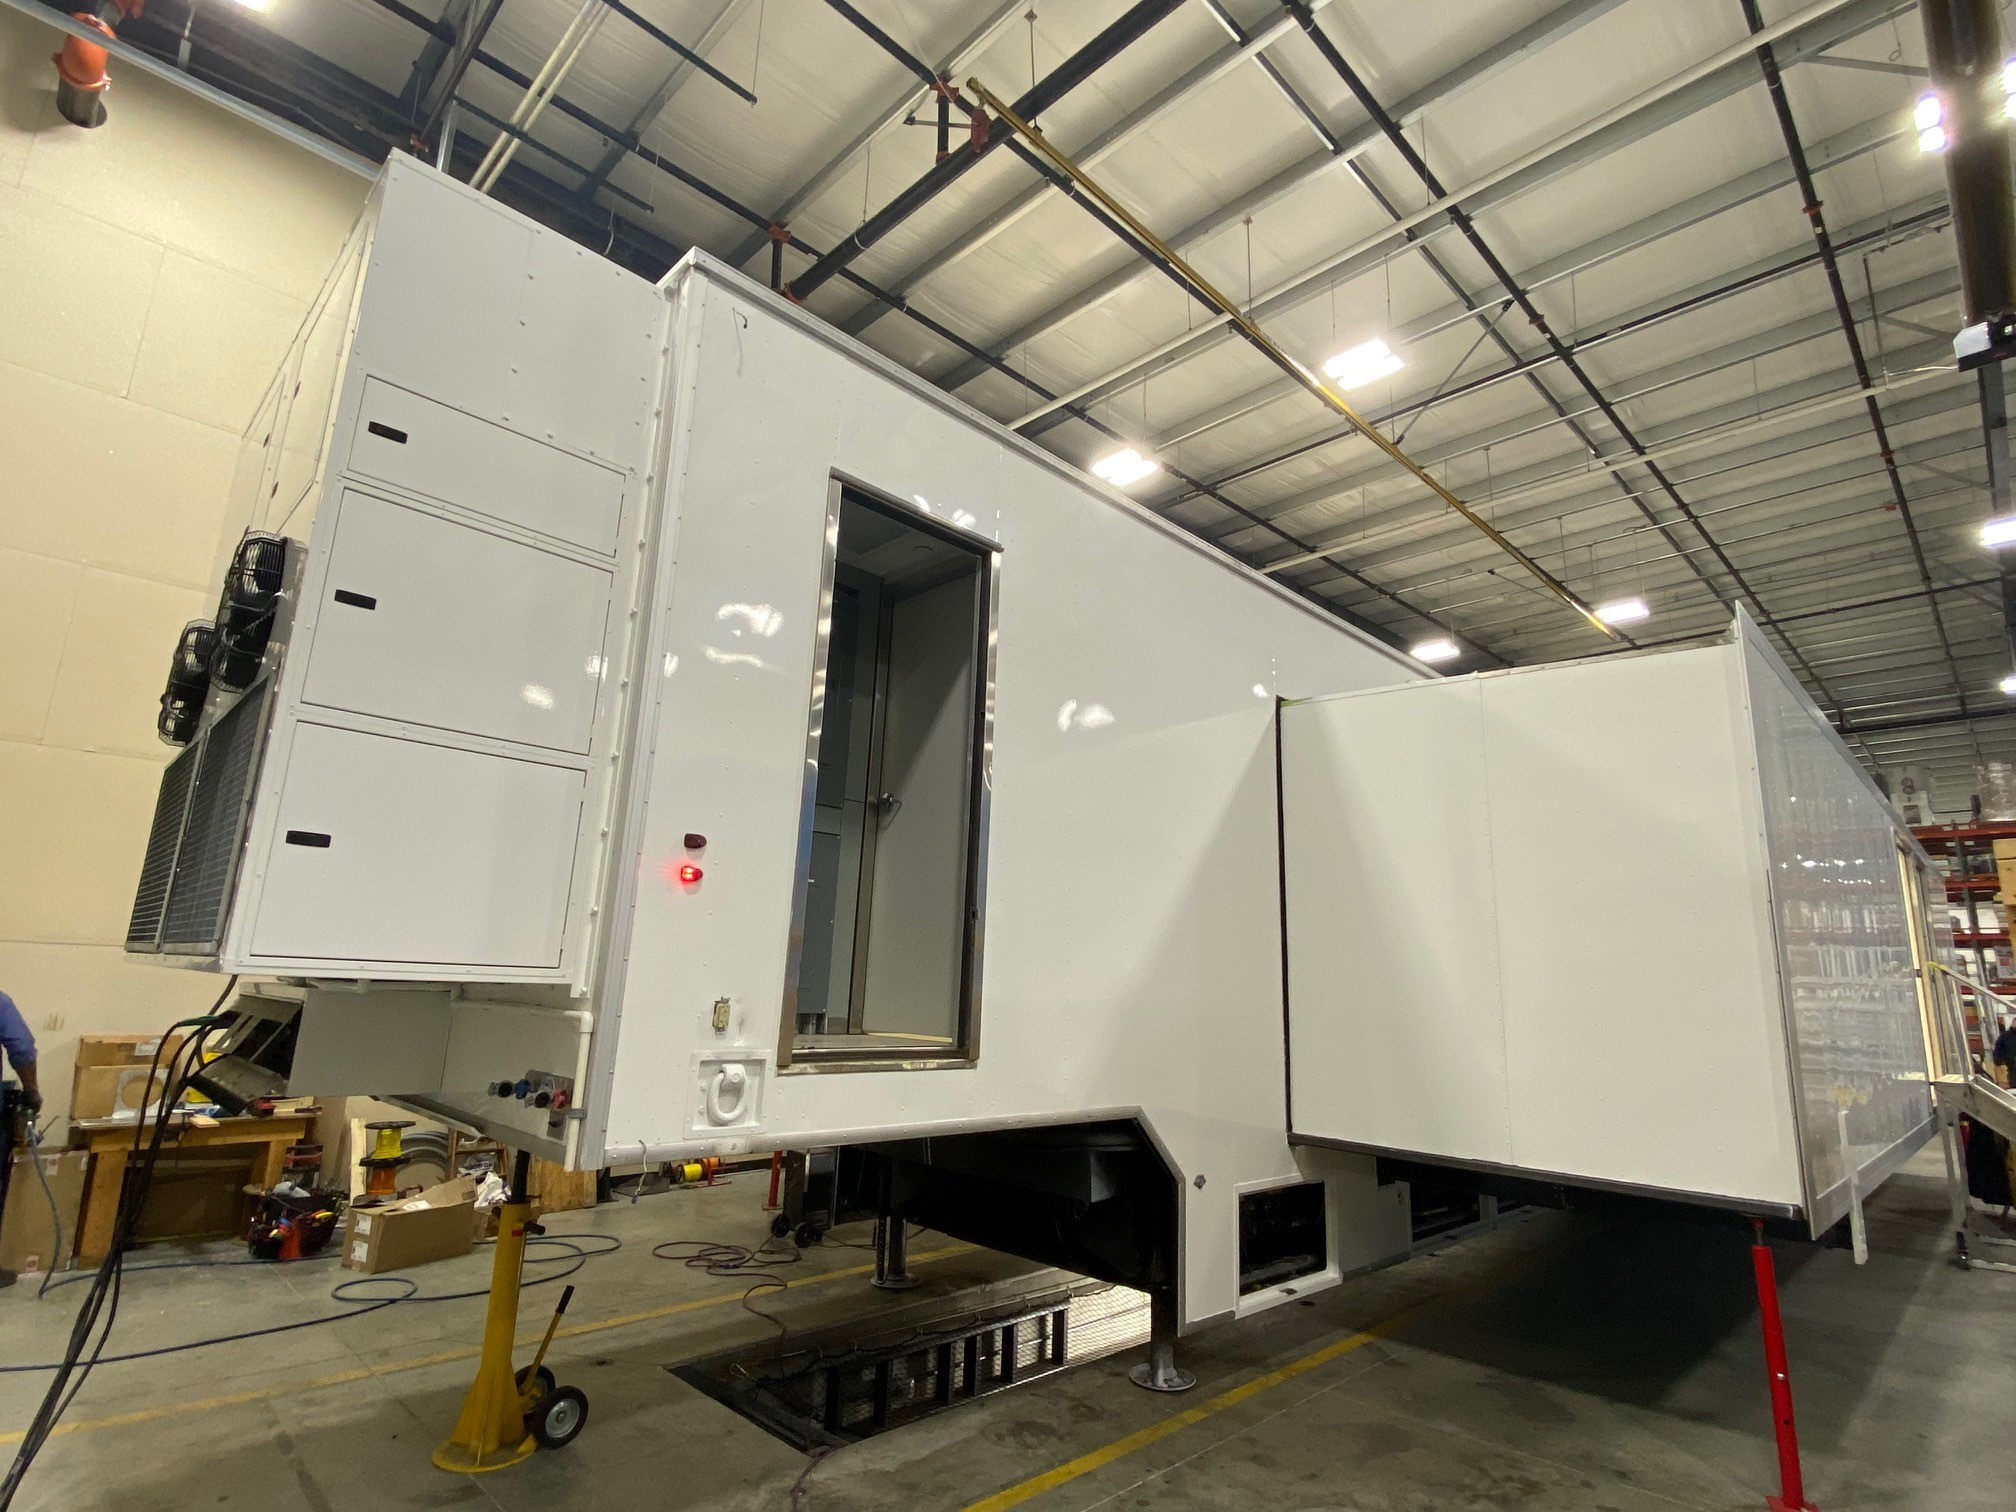 Mobile surgery trailer